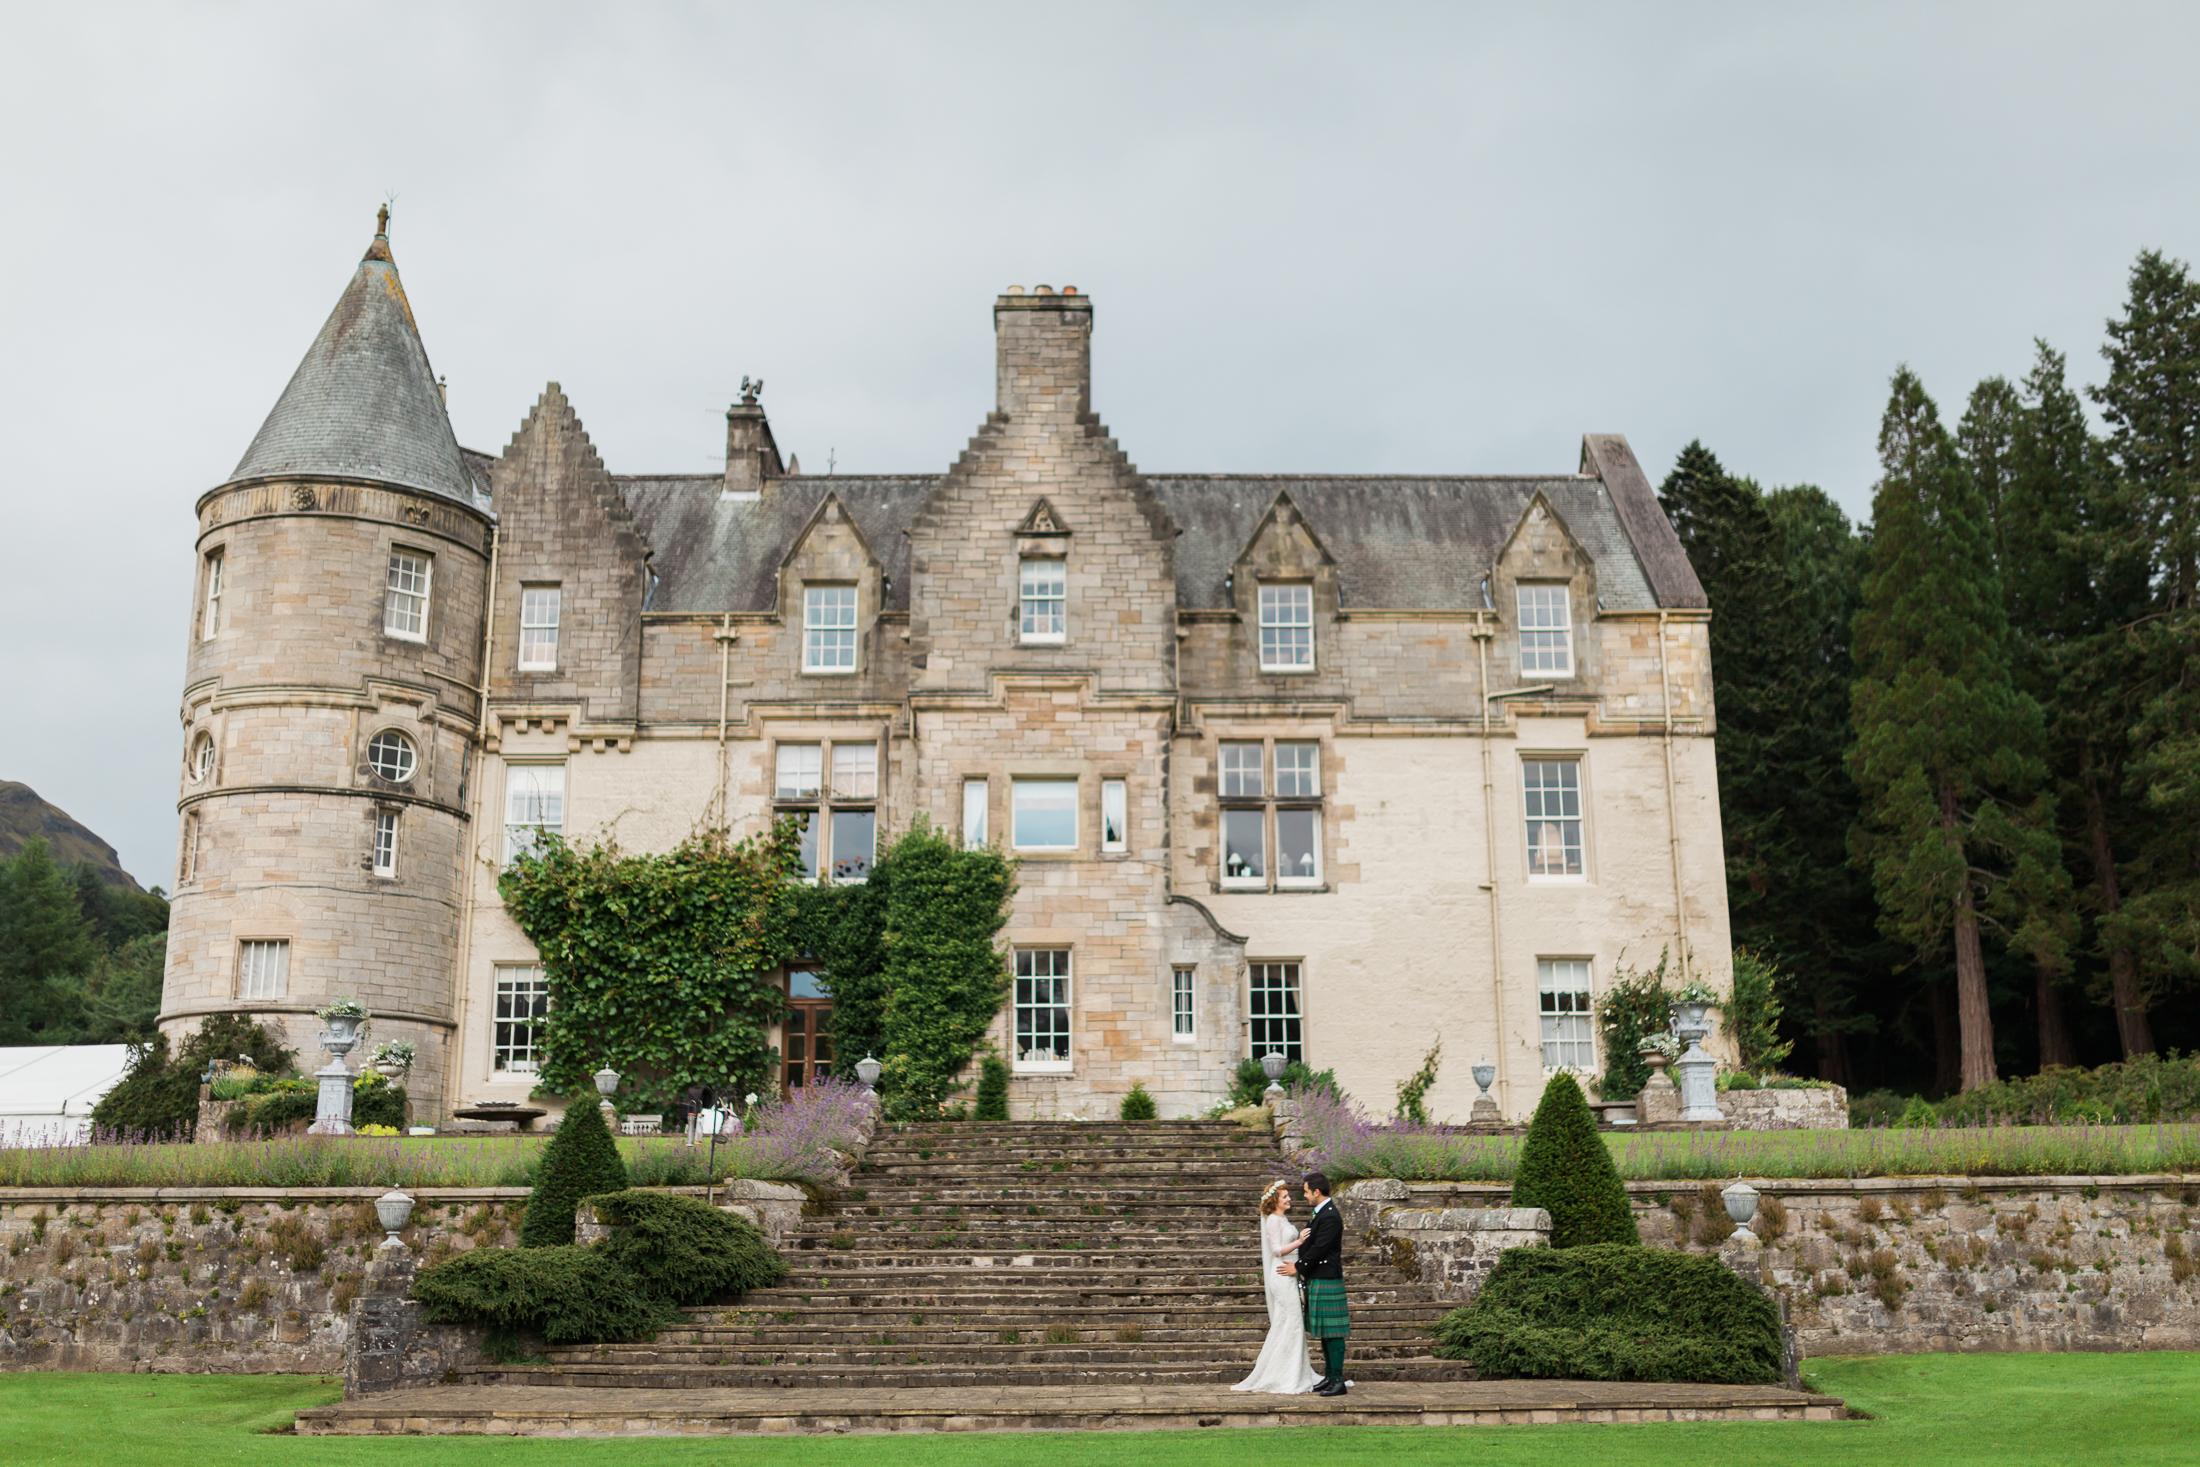 brahmin_calligraphy_weddings_scotland_glasgow.jpg